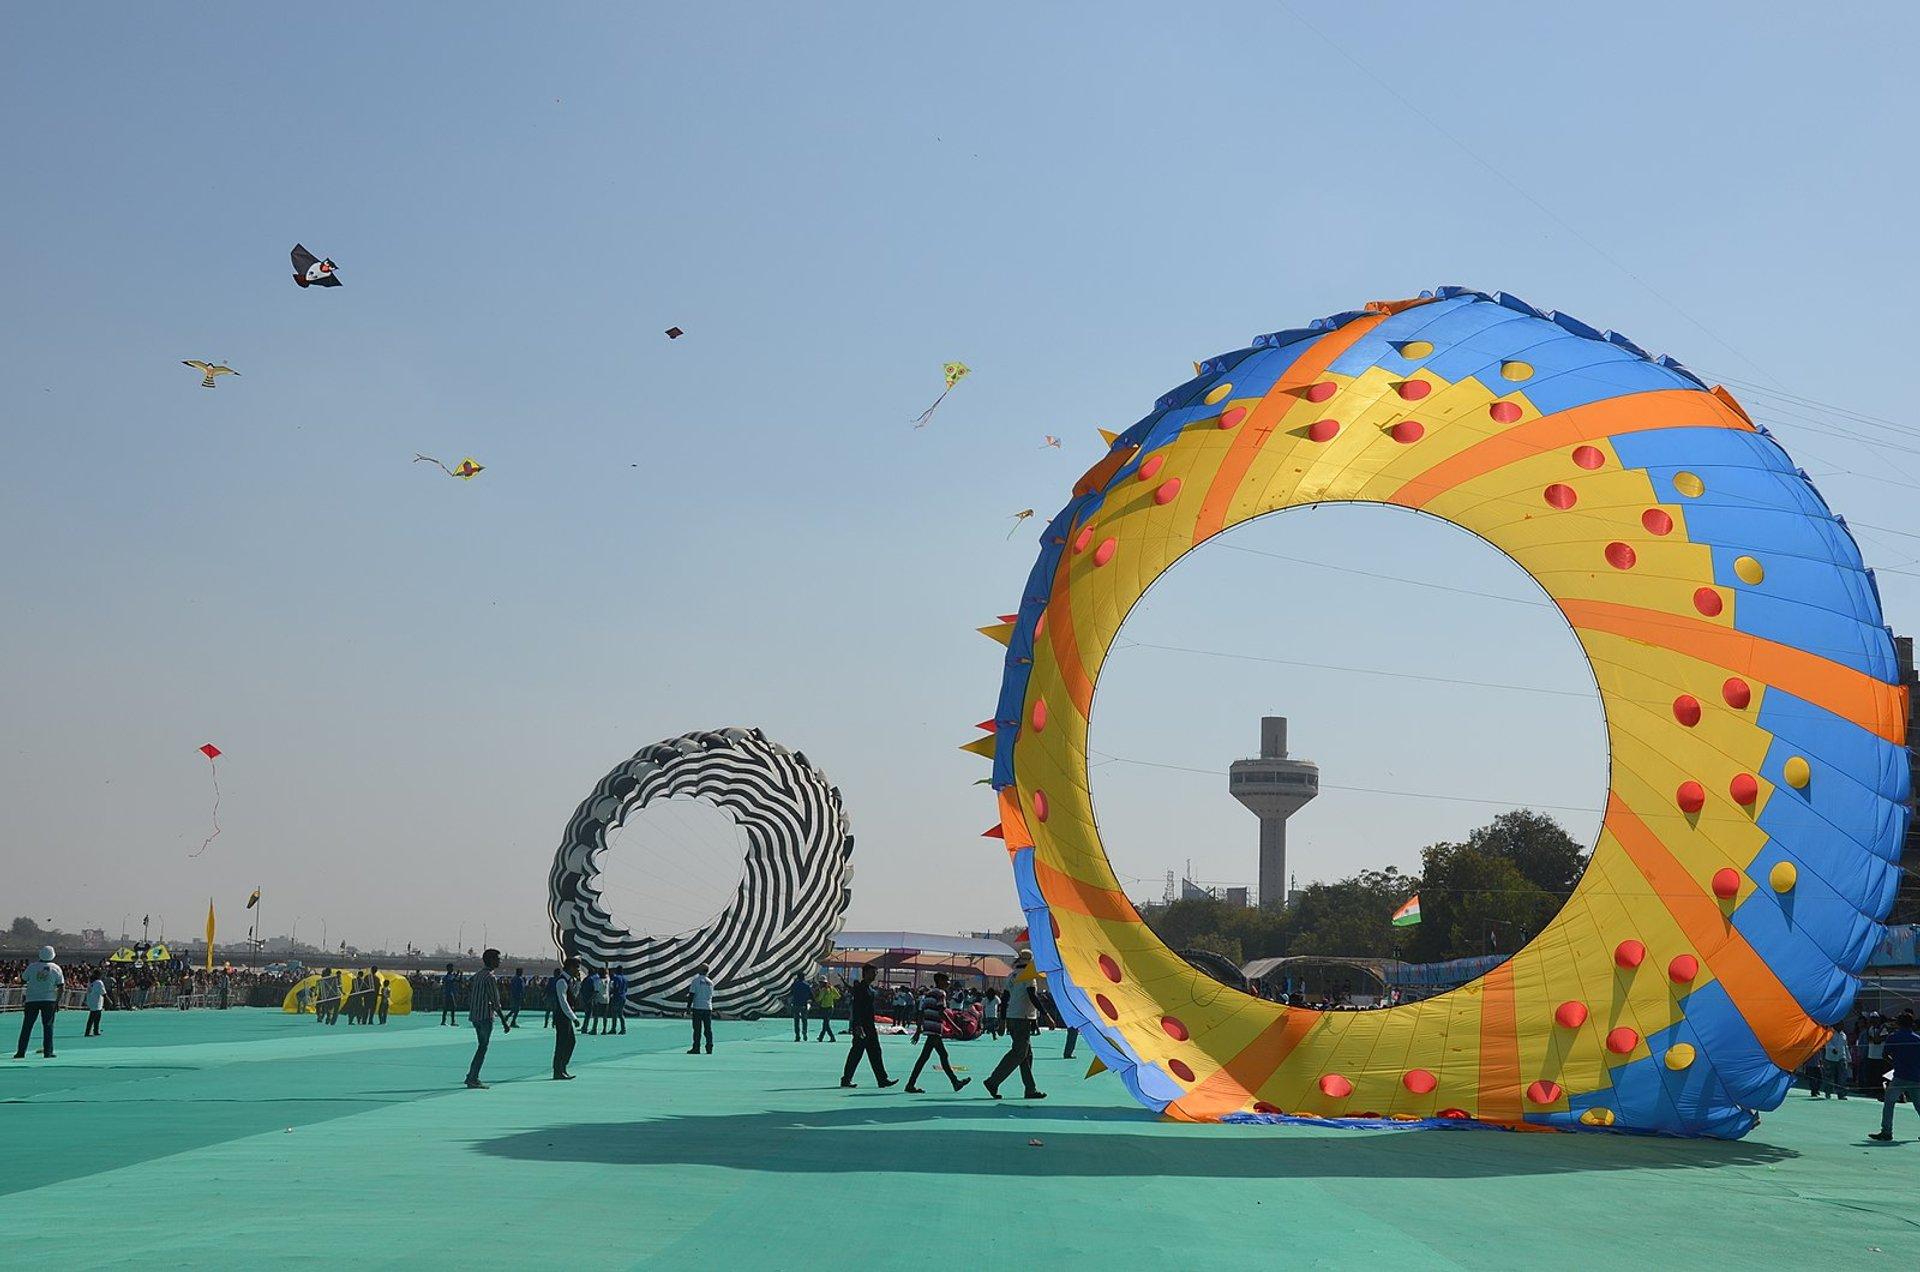 International Kite Festival (Uttarayan) in India 2019 - Best Time